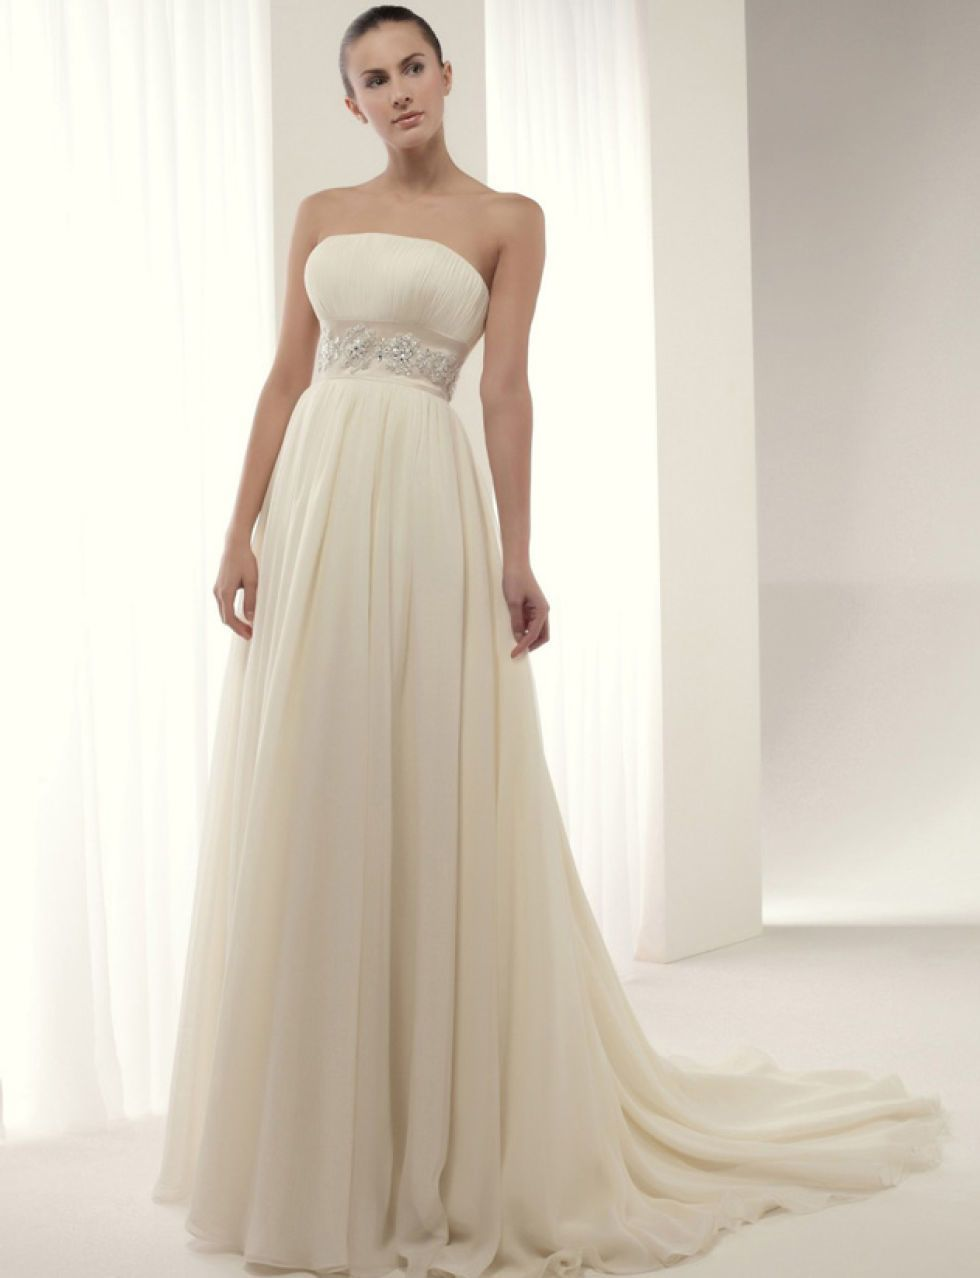 Alquiler trajes de novia en vigo